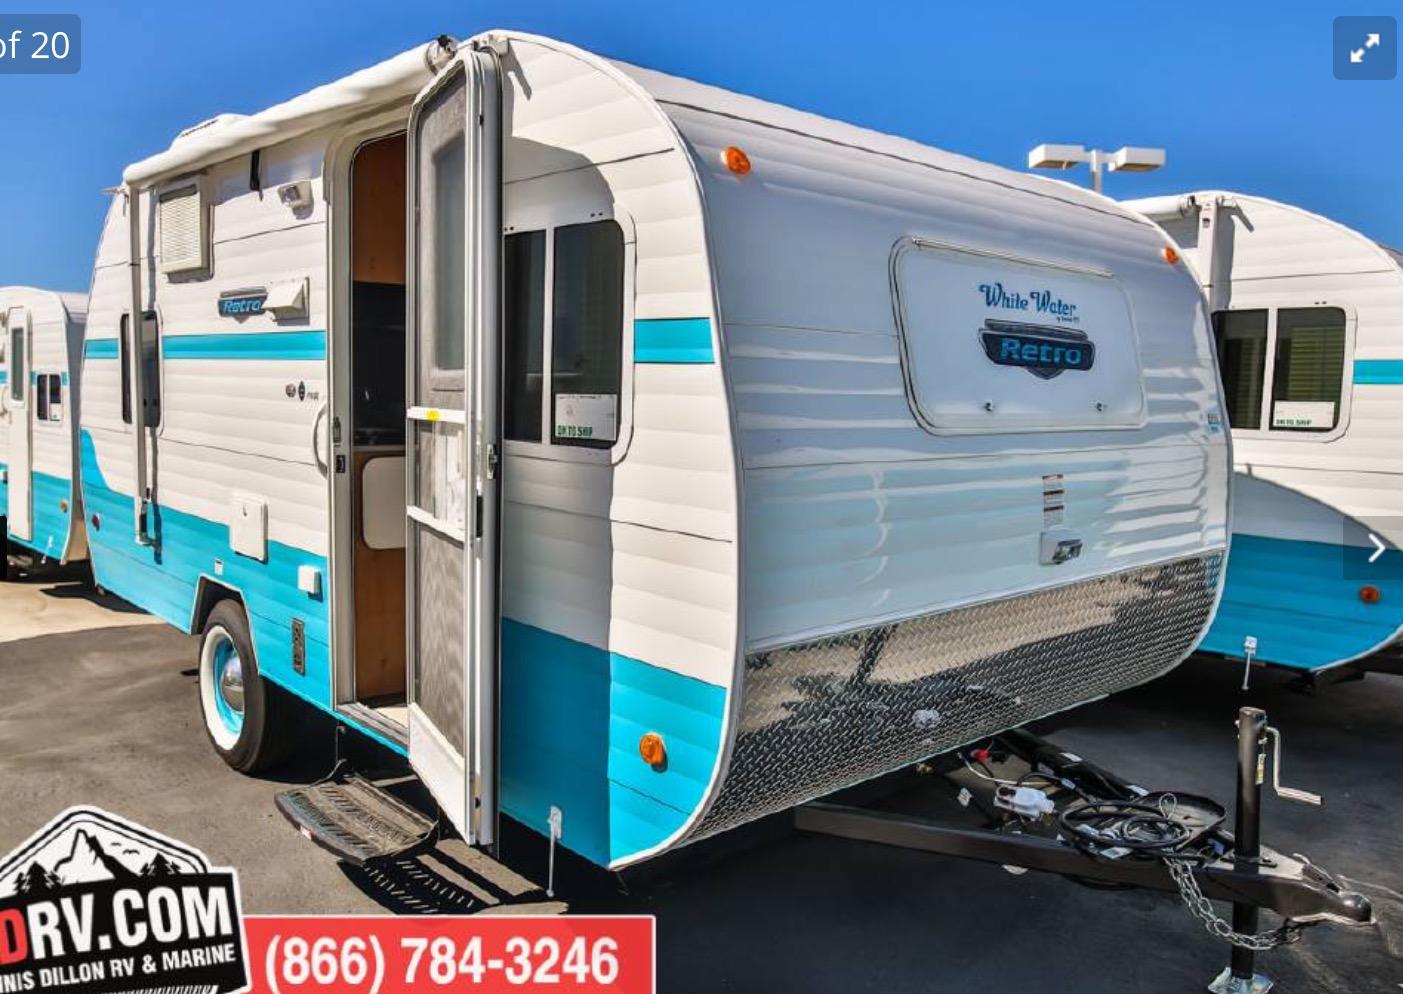 Buying a trailer. Which Riverside Retro camper size? - Toyota FJ ...